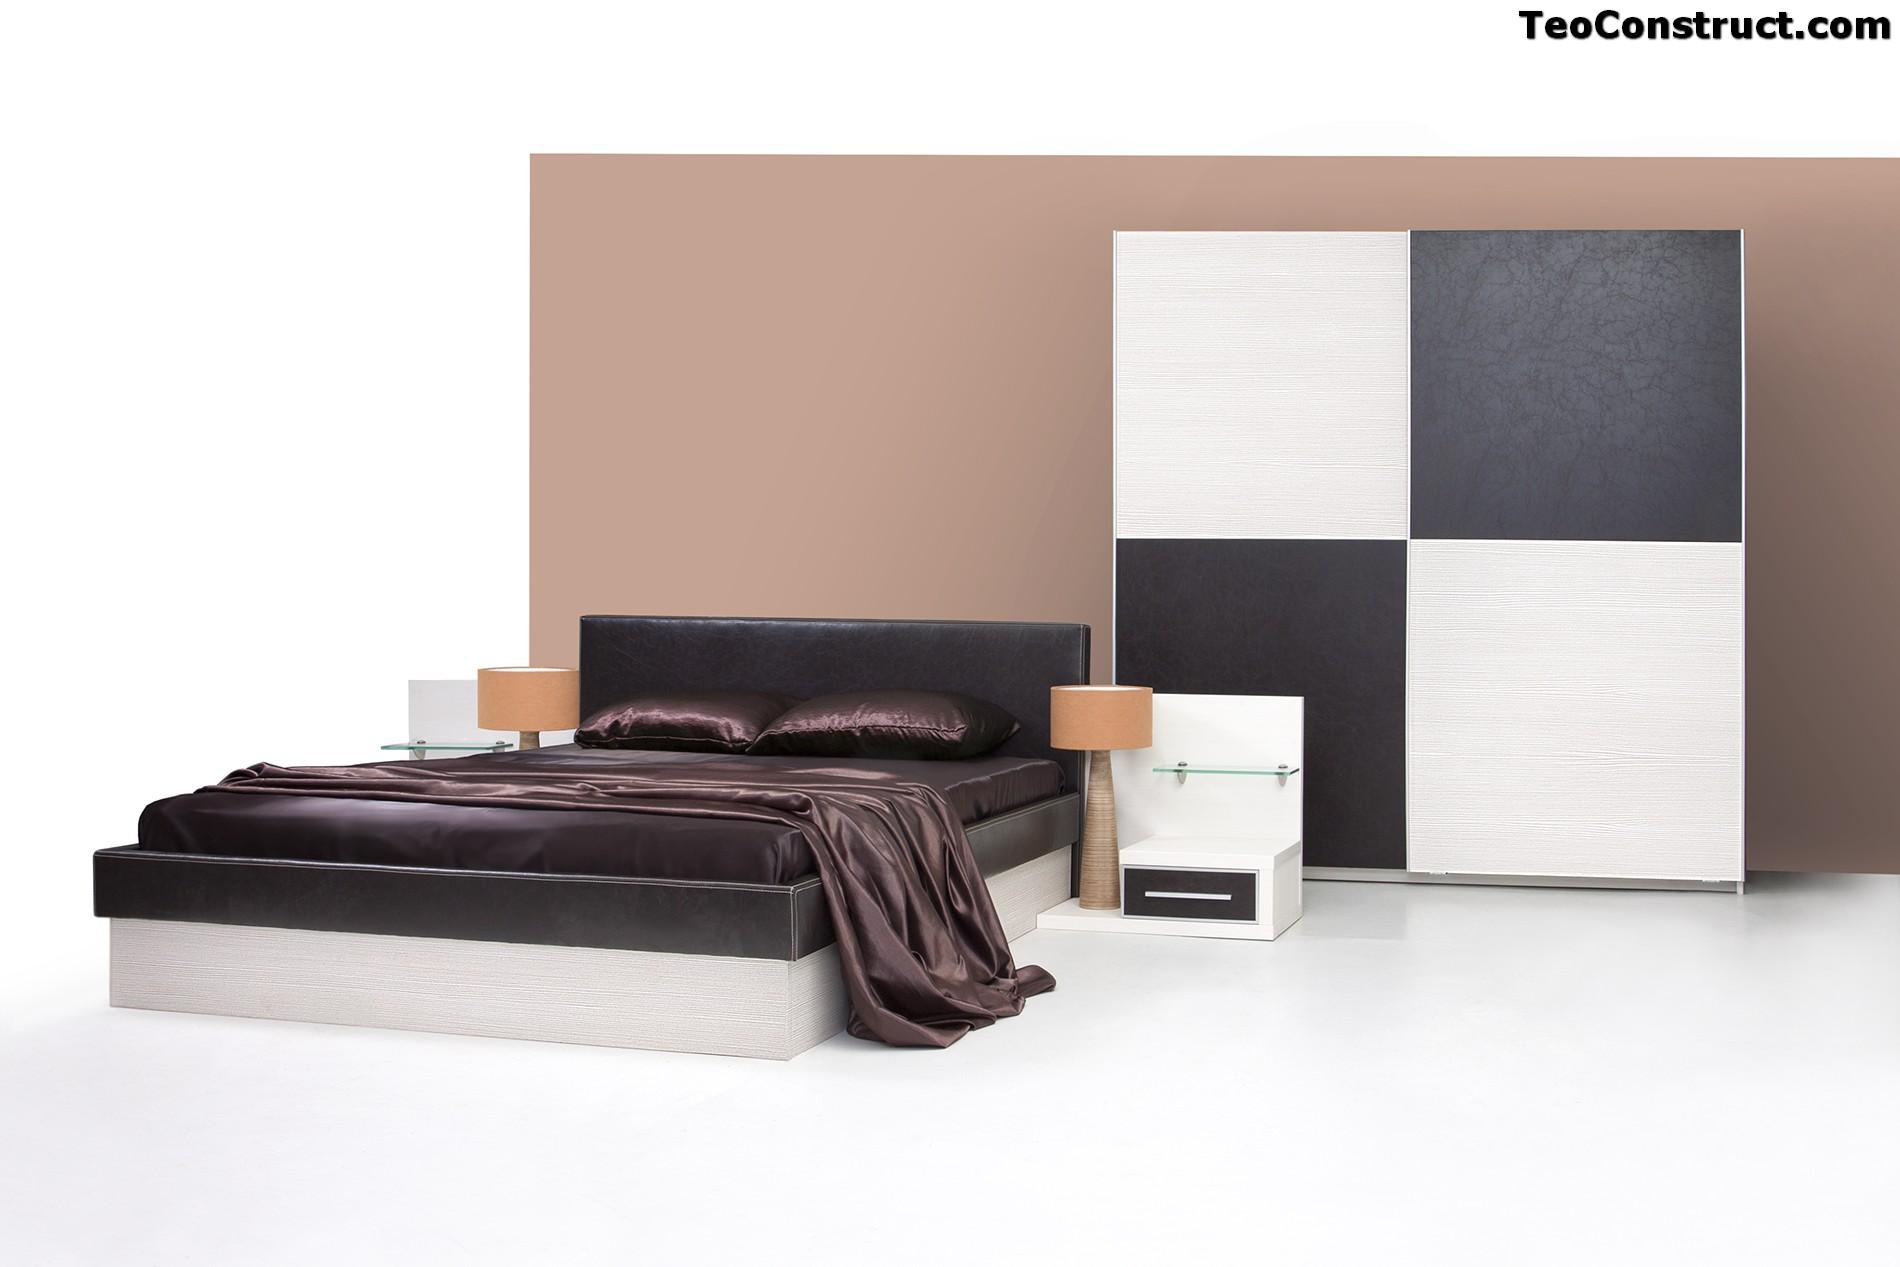 Dormitoare Magnum de calitate02